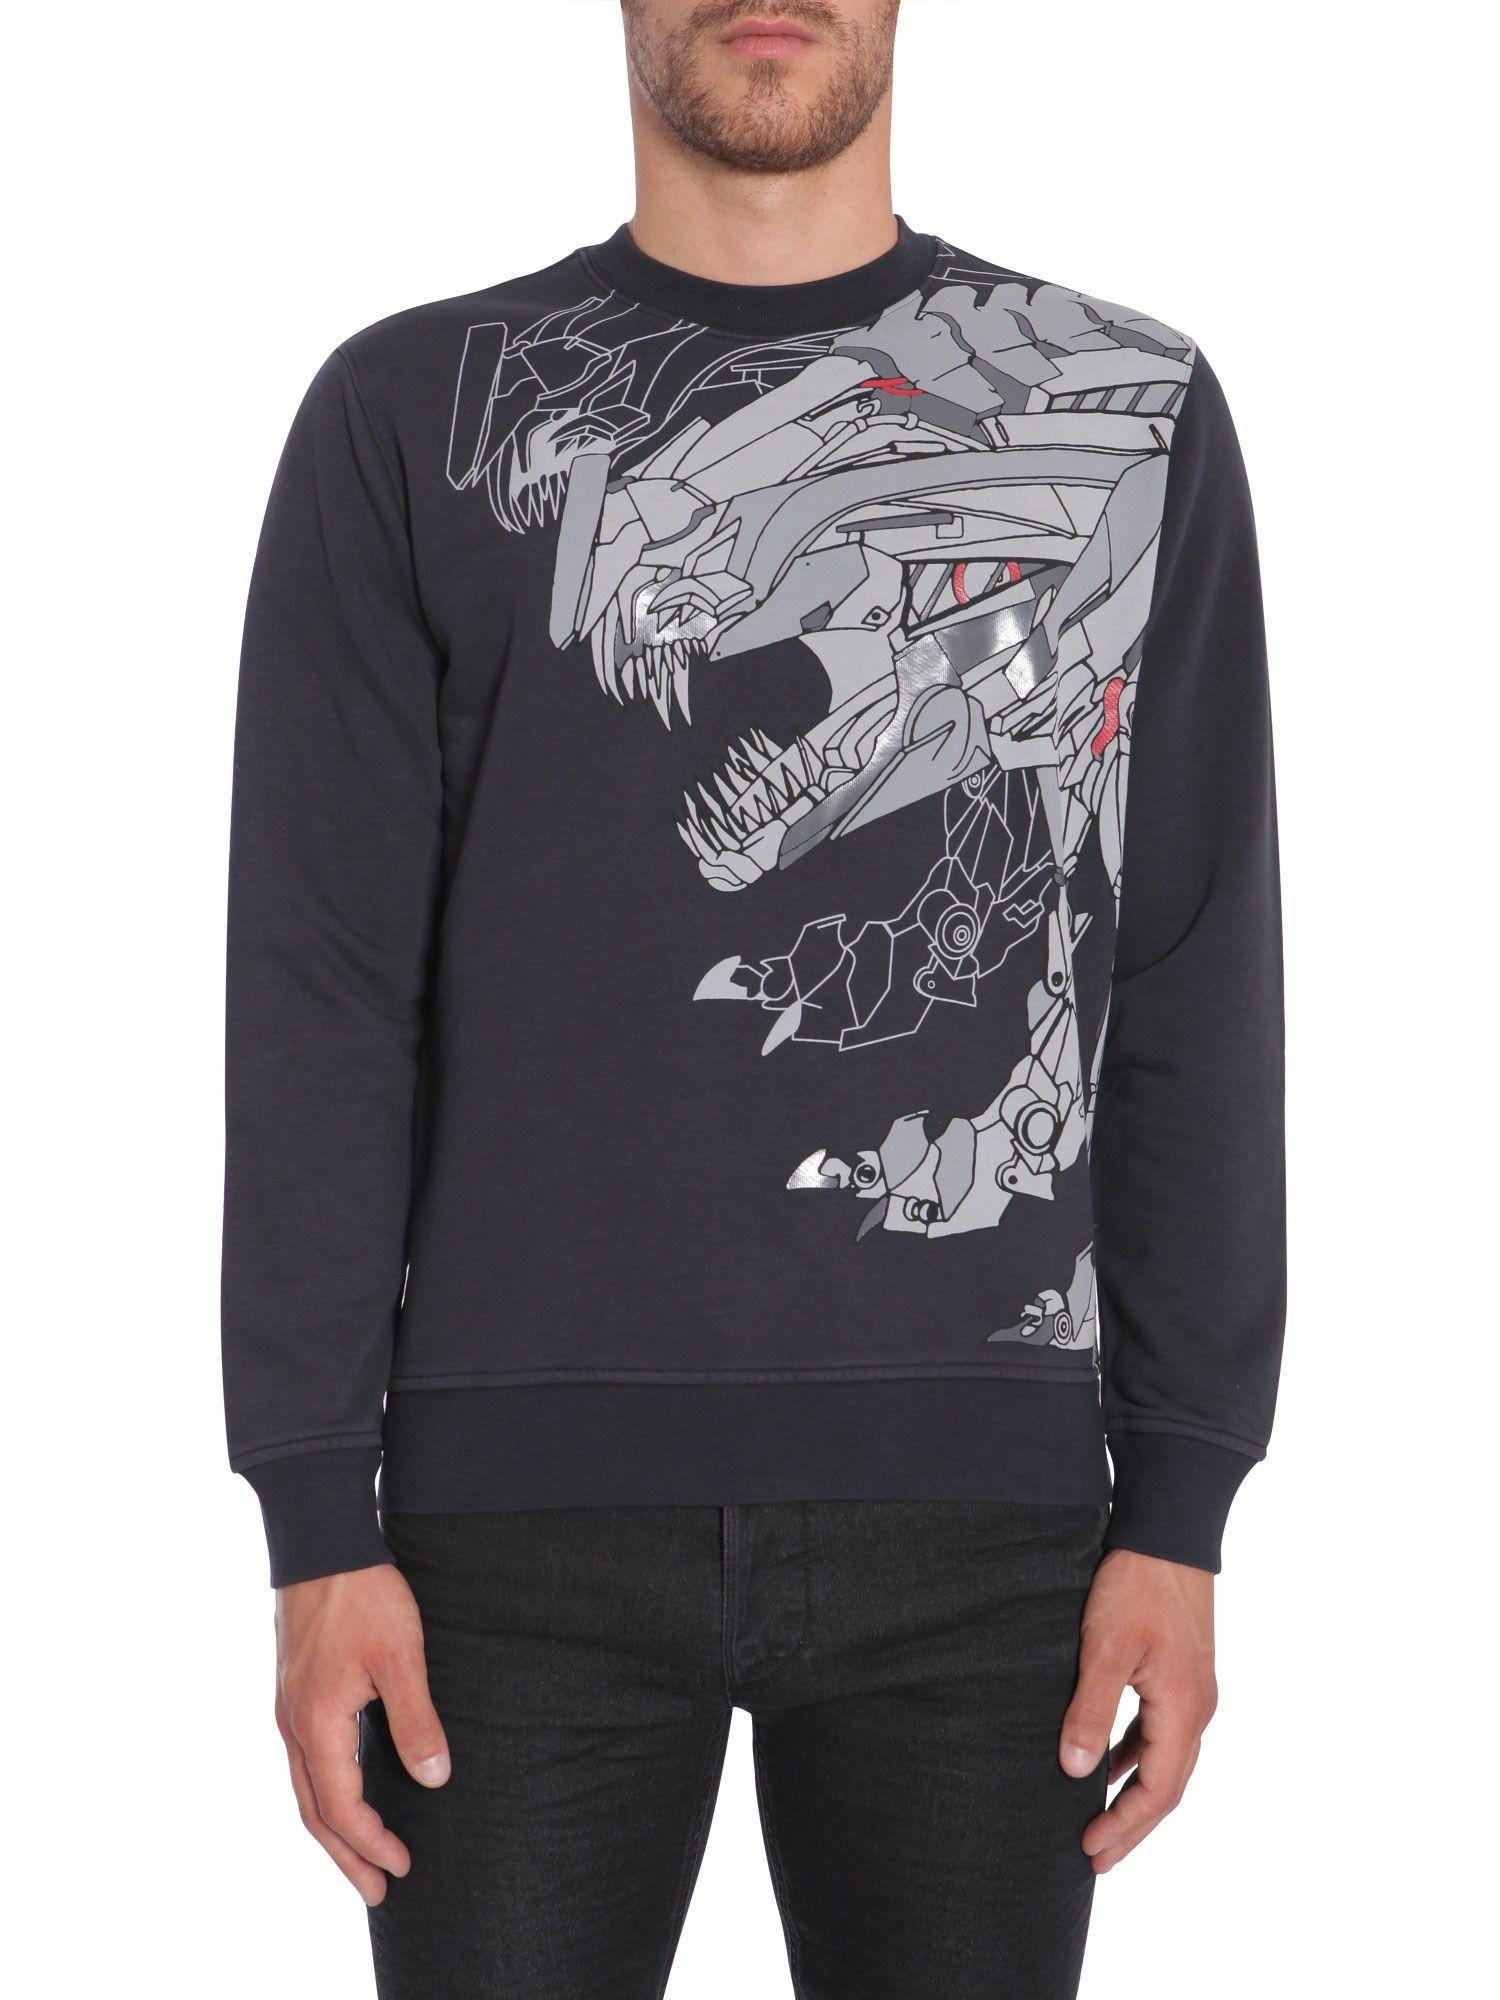 Diesel Black Gold Crew-Neck Sweatshirt In Blu